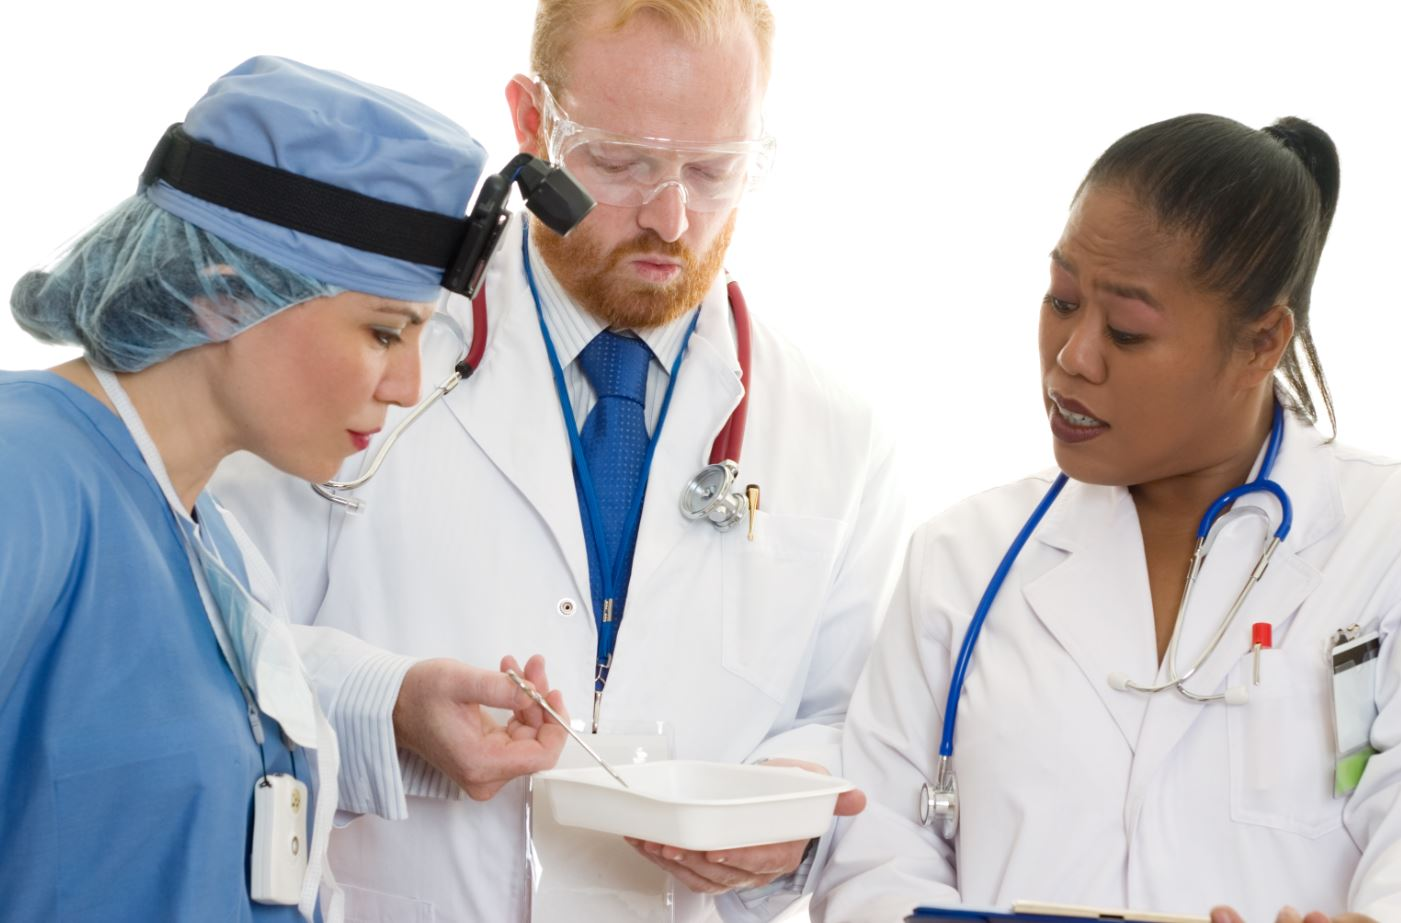 Uniformes para doctores 2018.